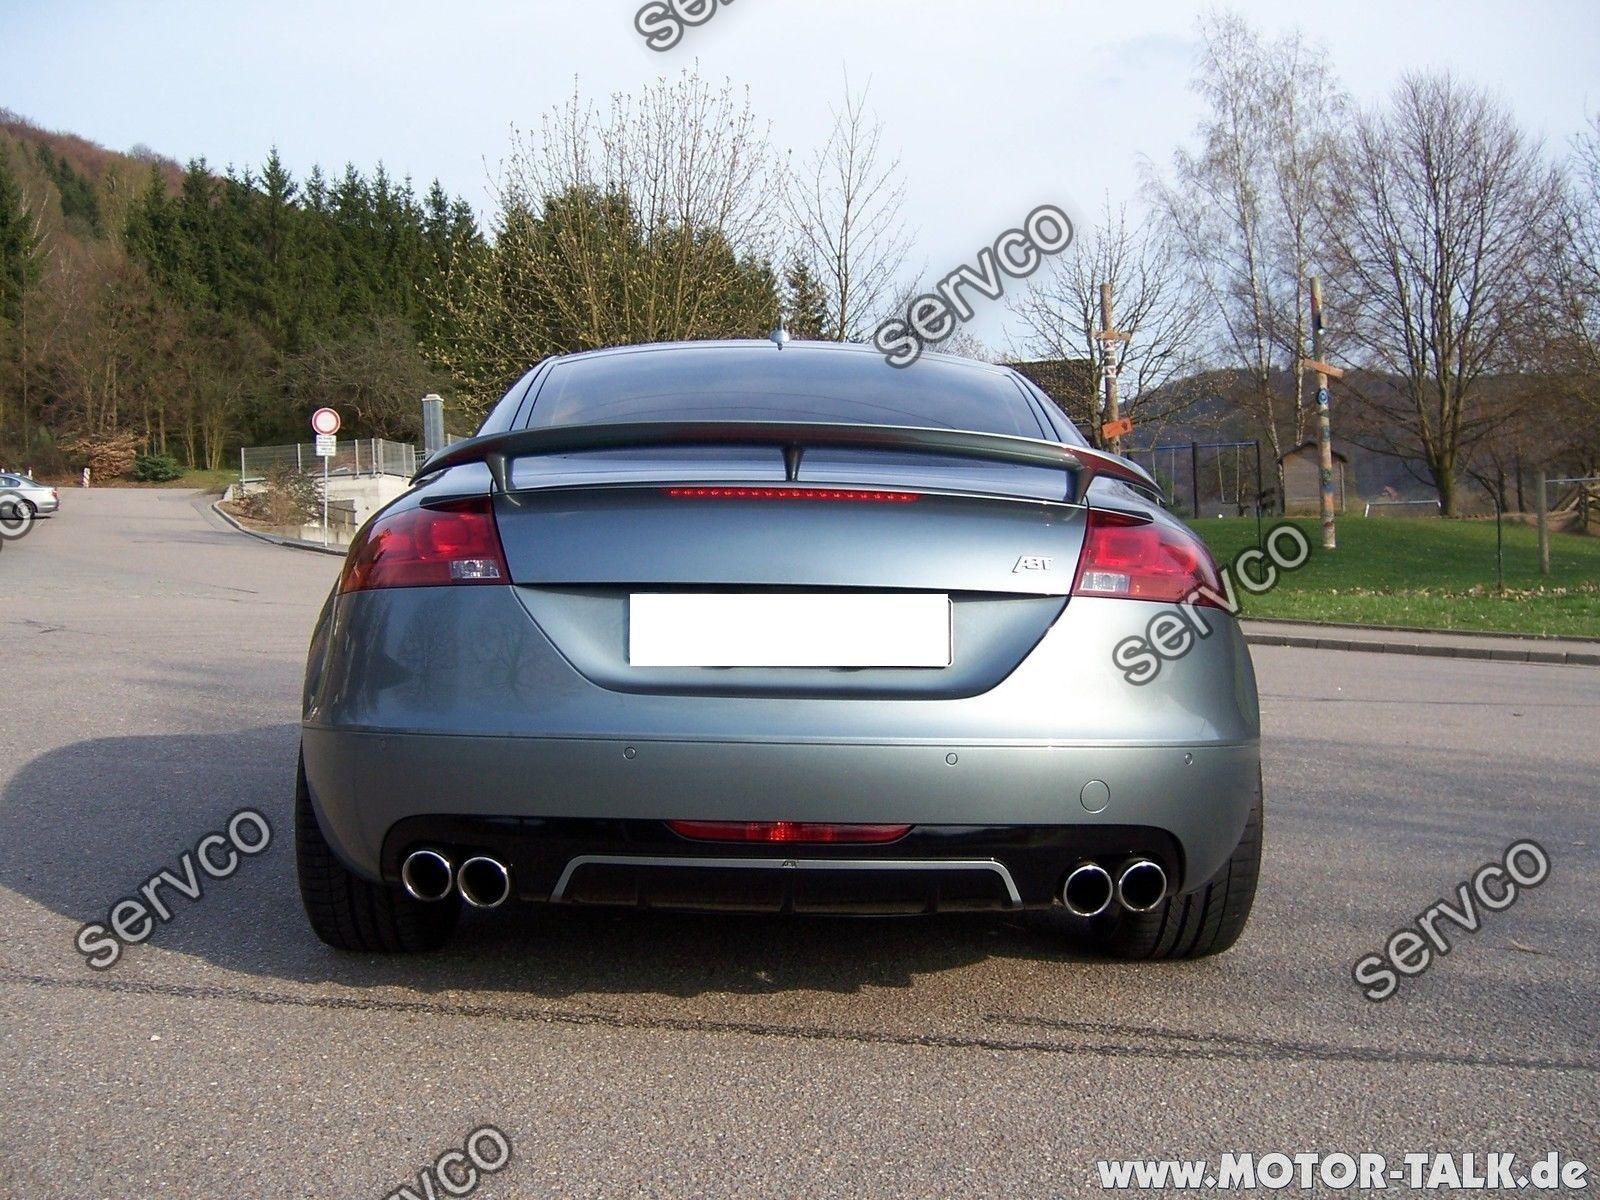 Difuzor bara spate Audi TT 8J Sline S ABT Ab look DTM Votex TT S RS 2006-2014 v2